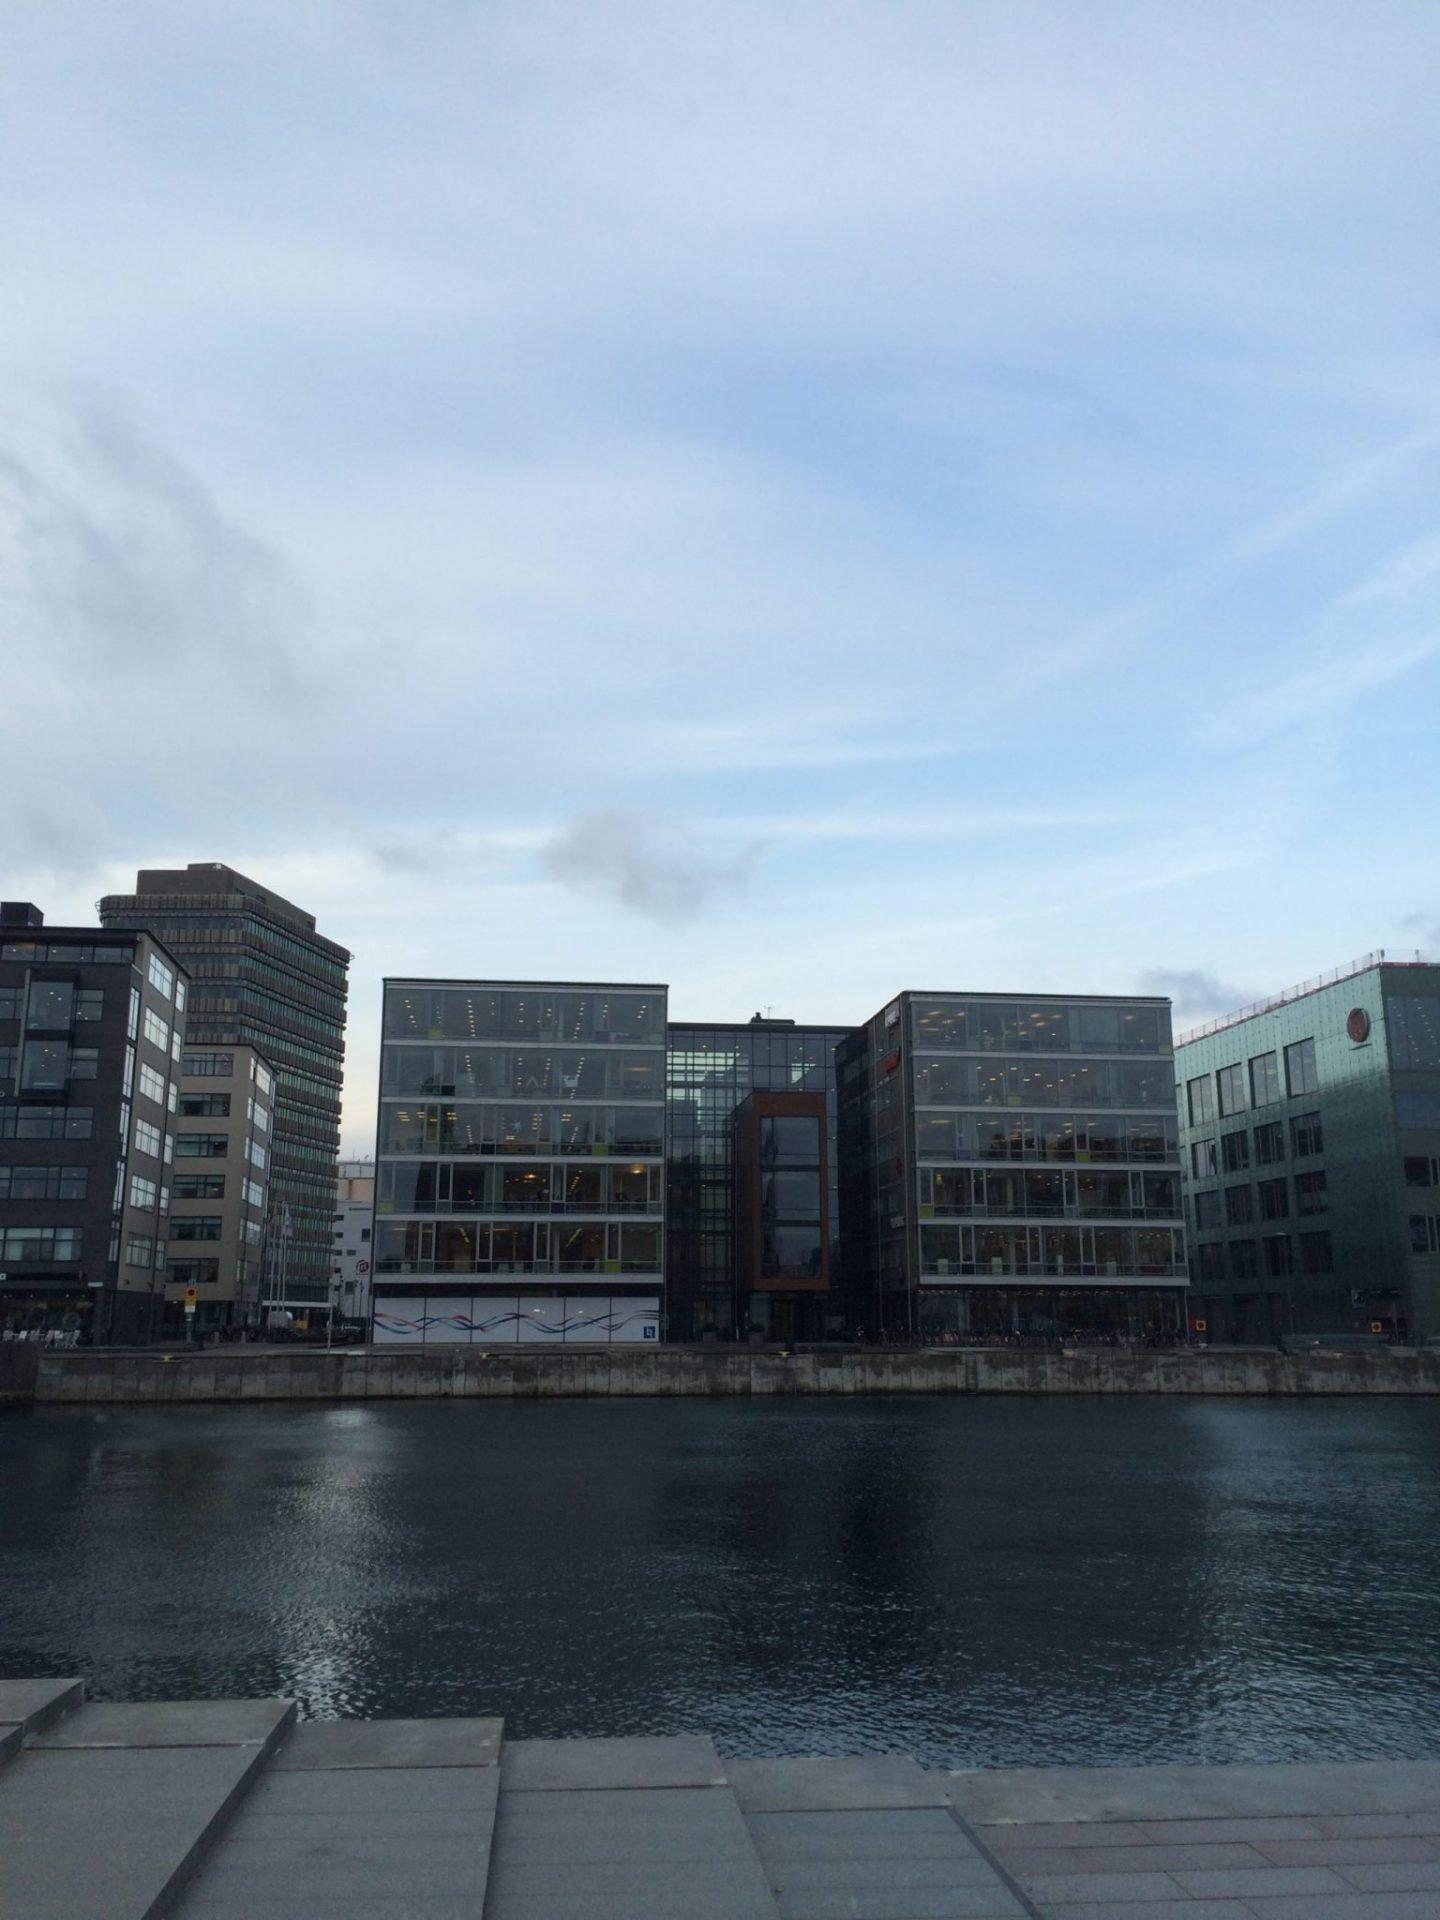 IMG 2782 1440x1920 - Malmö: a modern city